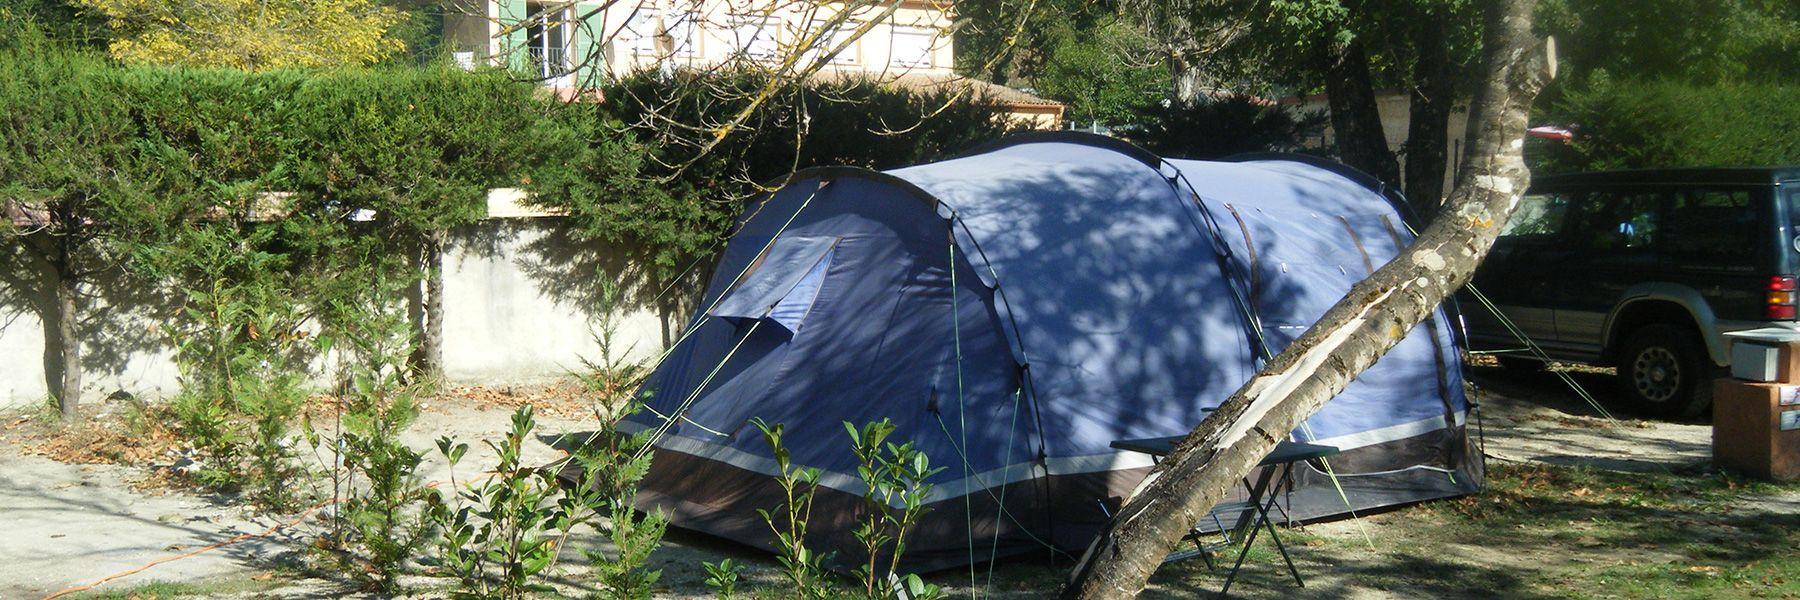 Nos emplacements de camping